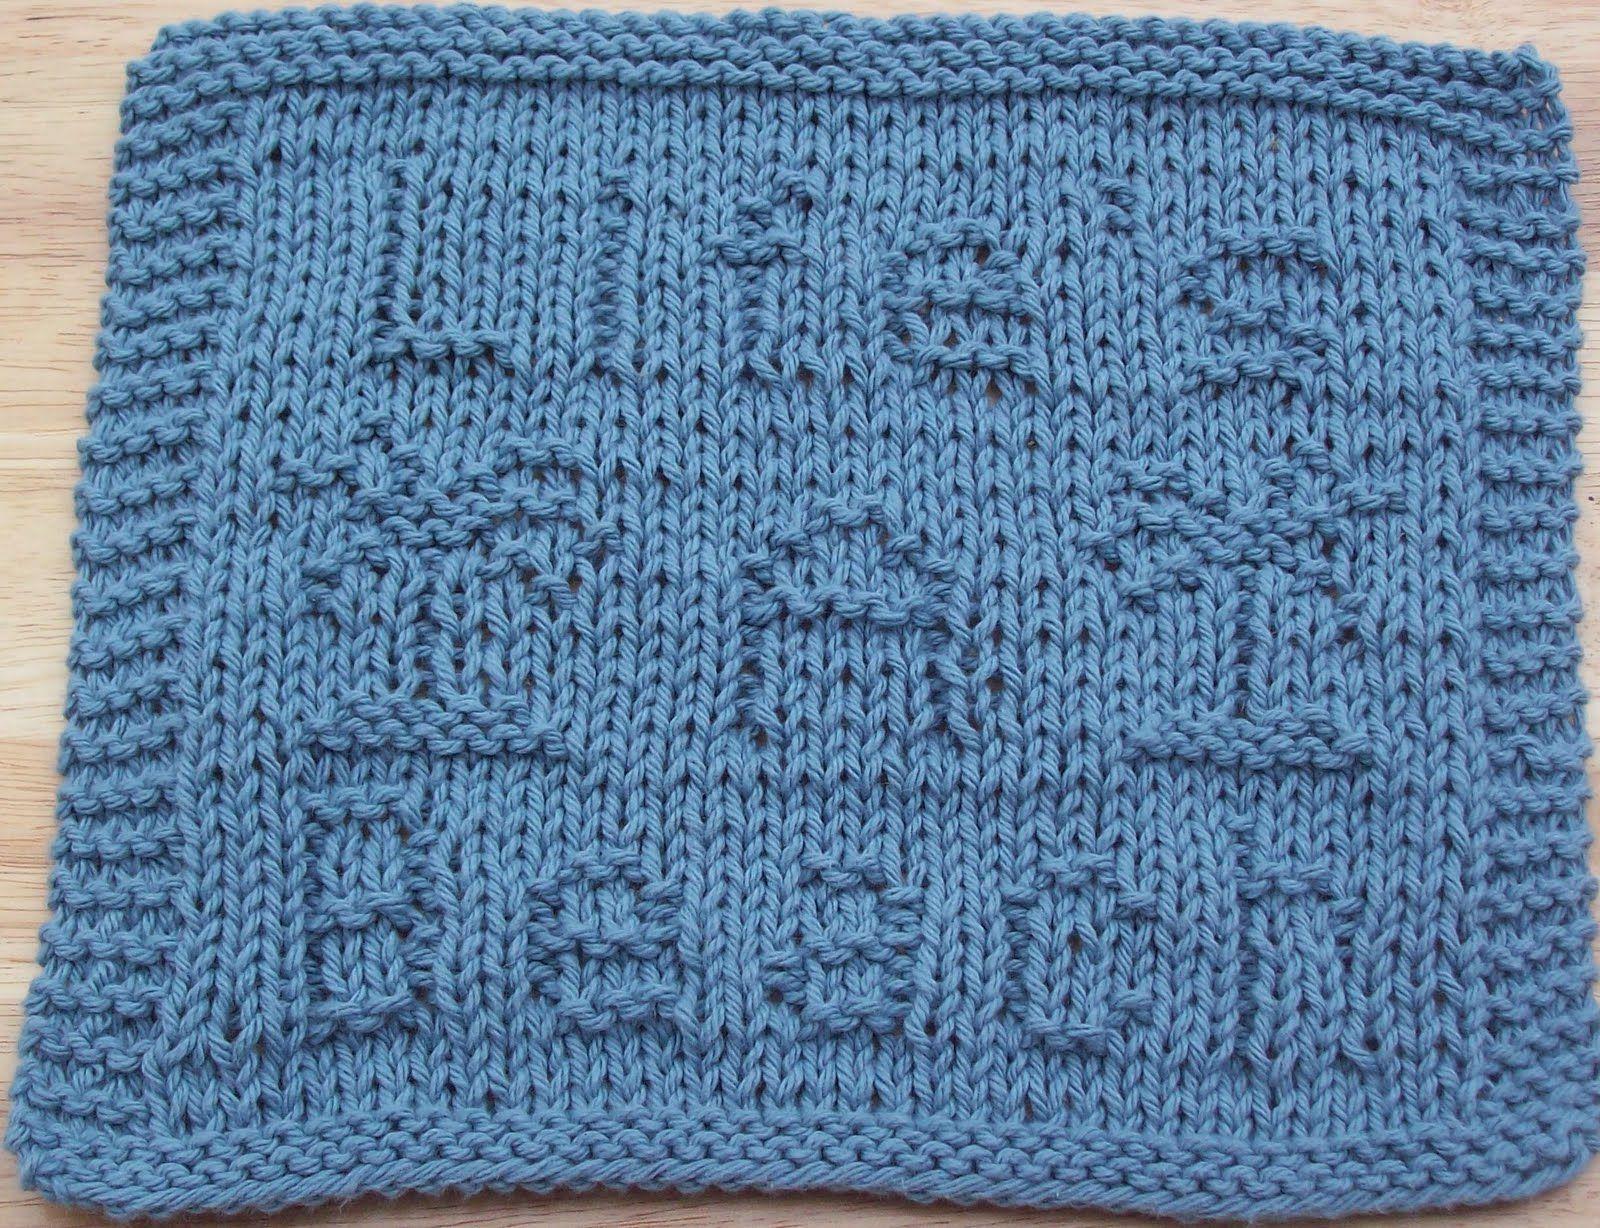 Lifesabeachg Knit Dish Cloths Pinterest Knit Patterns